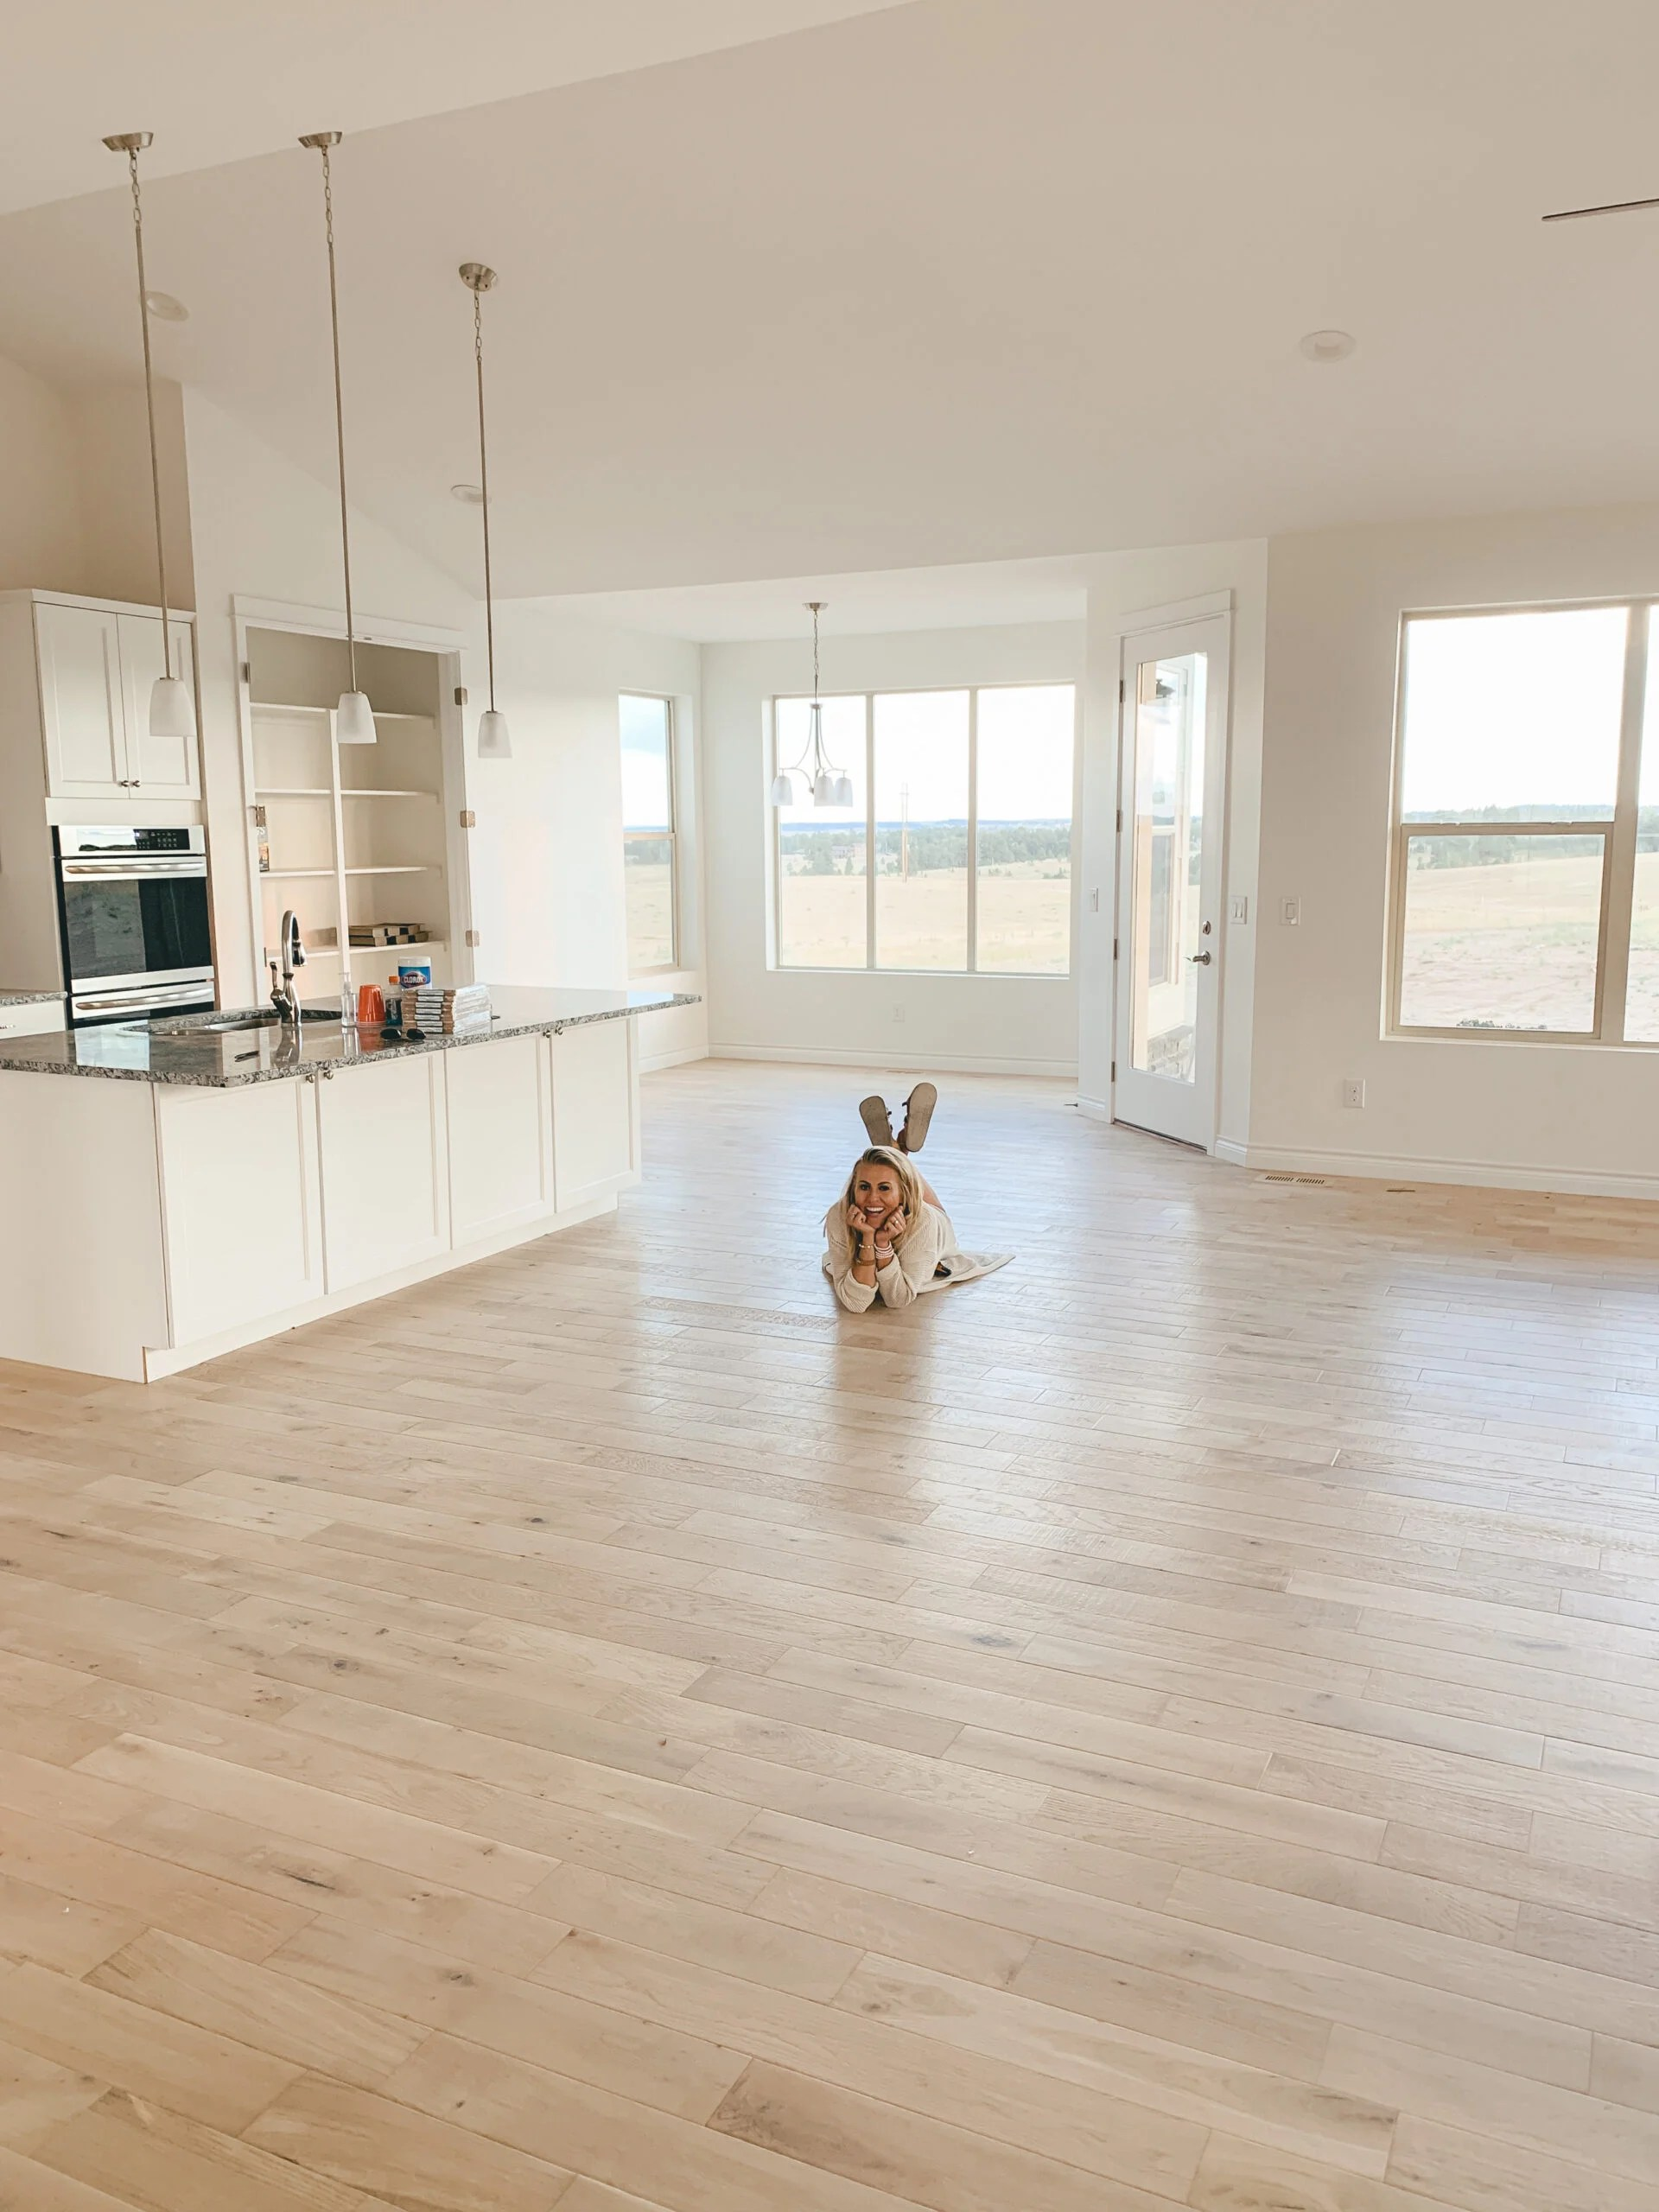 Wood Floors From Home Depot, Premier Laminate Flooring Reviews